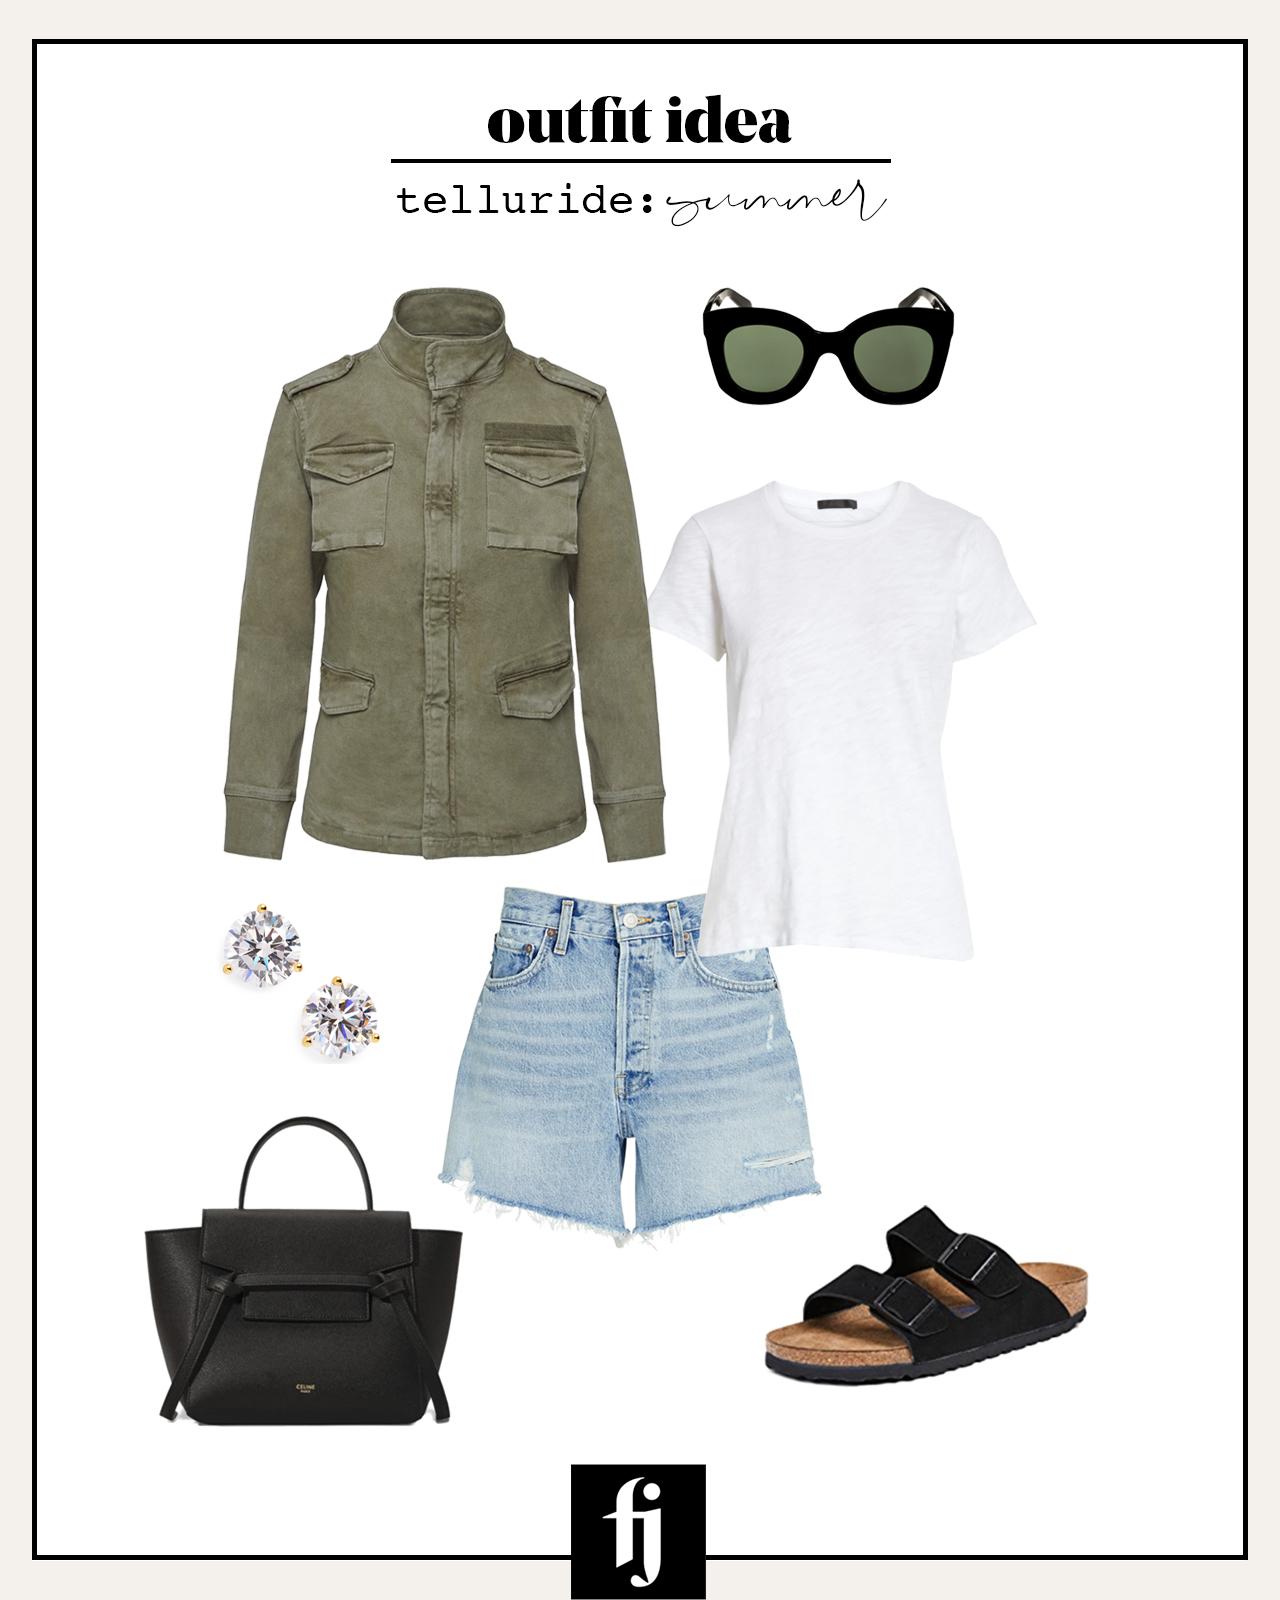 telluride summer outfit idea